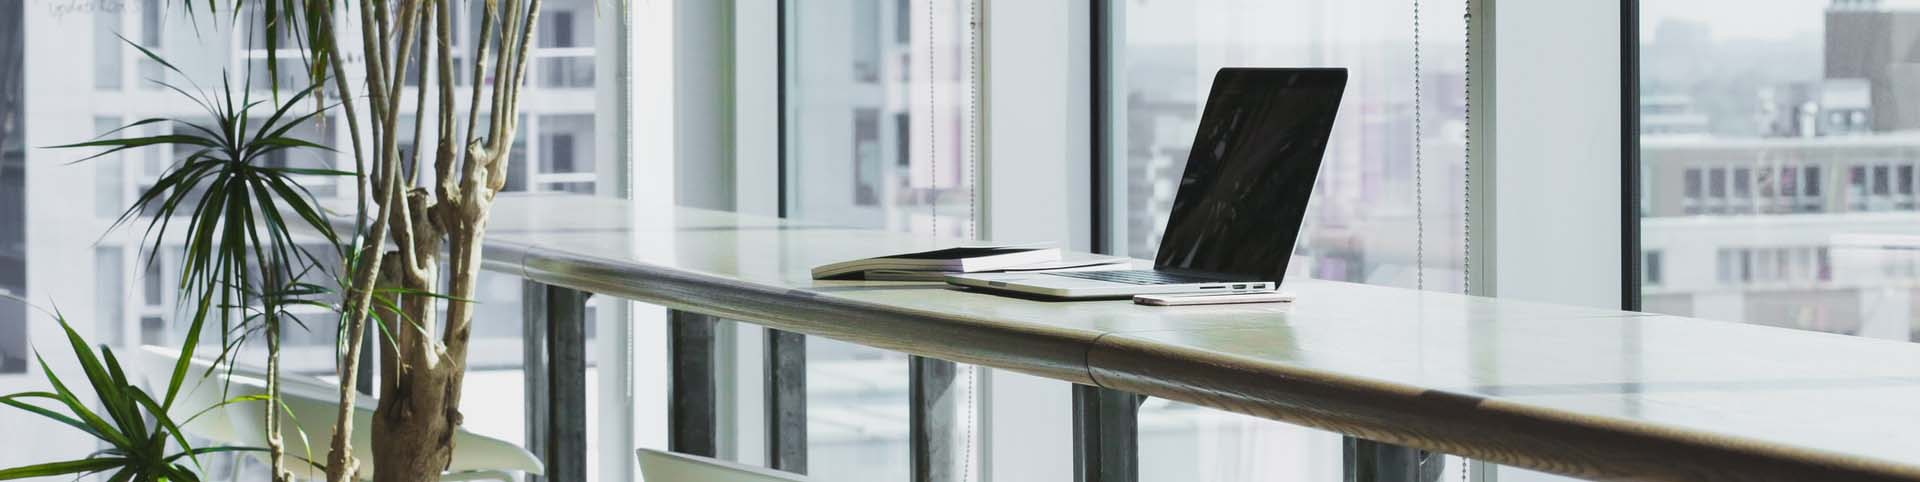 bg-laptop-sitting-on-long-desk-by-large-windows